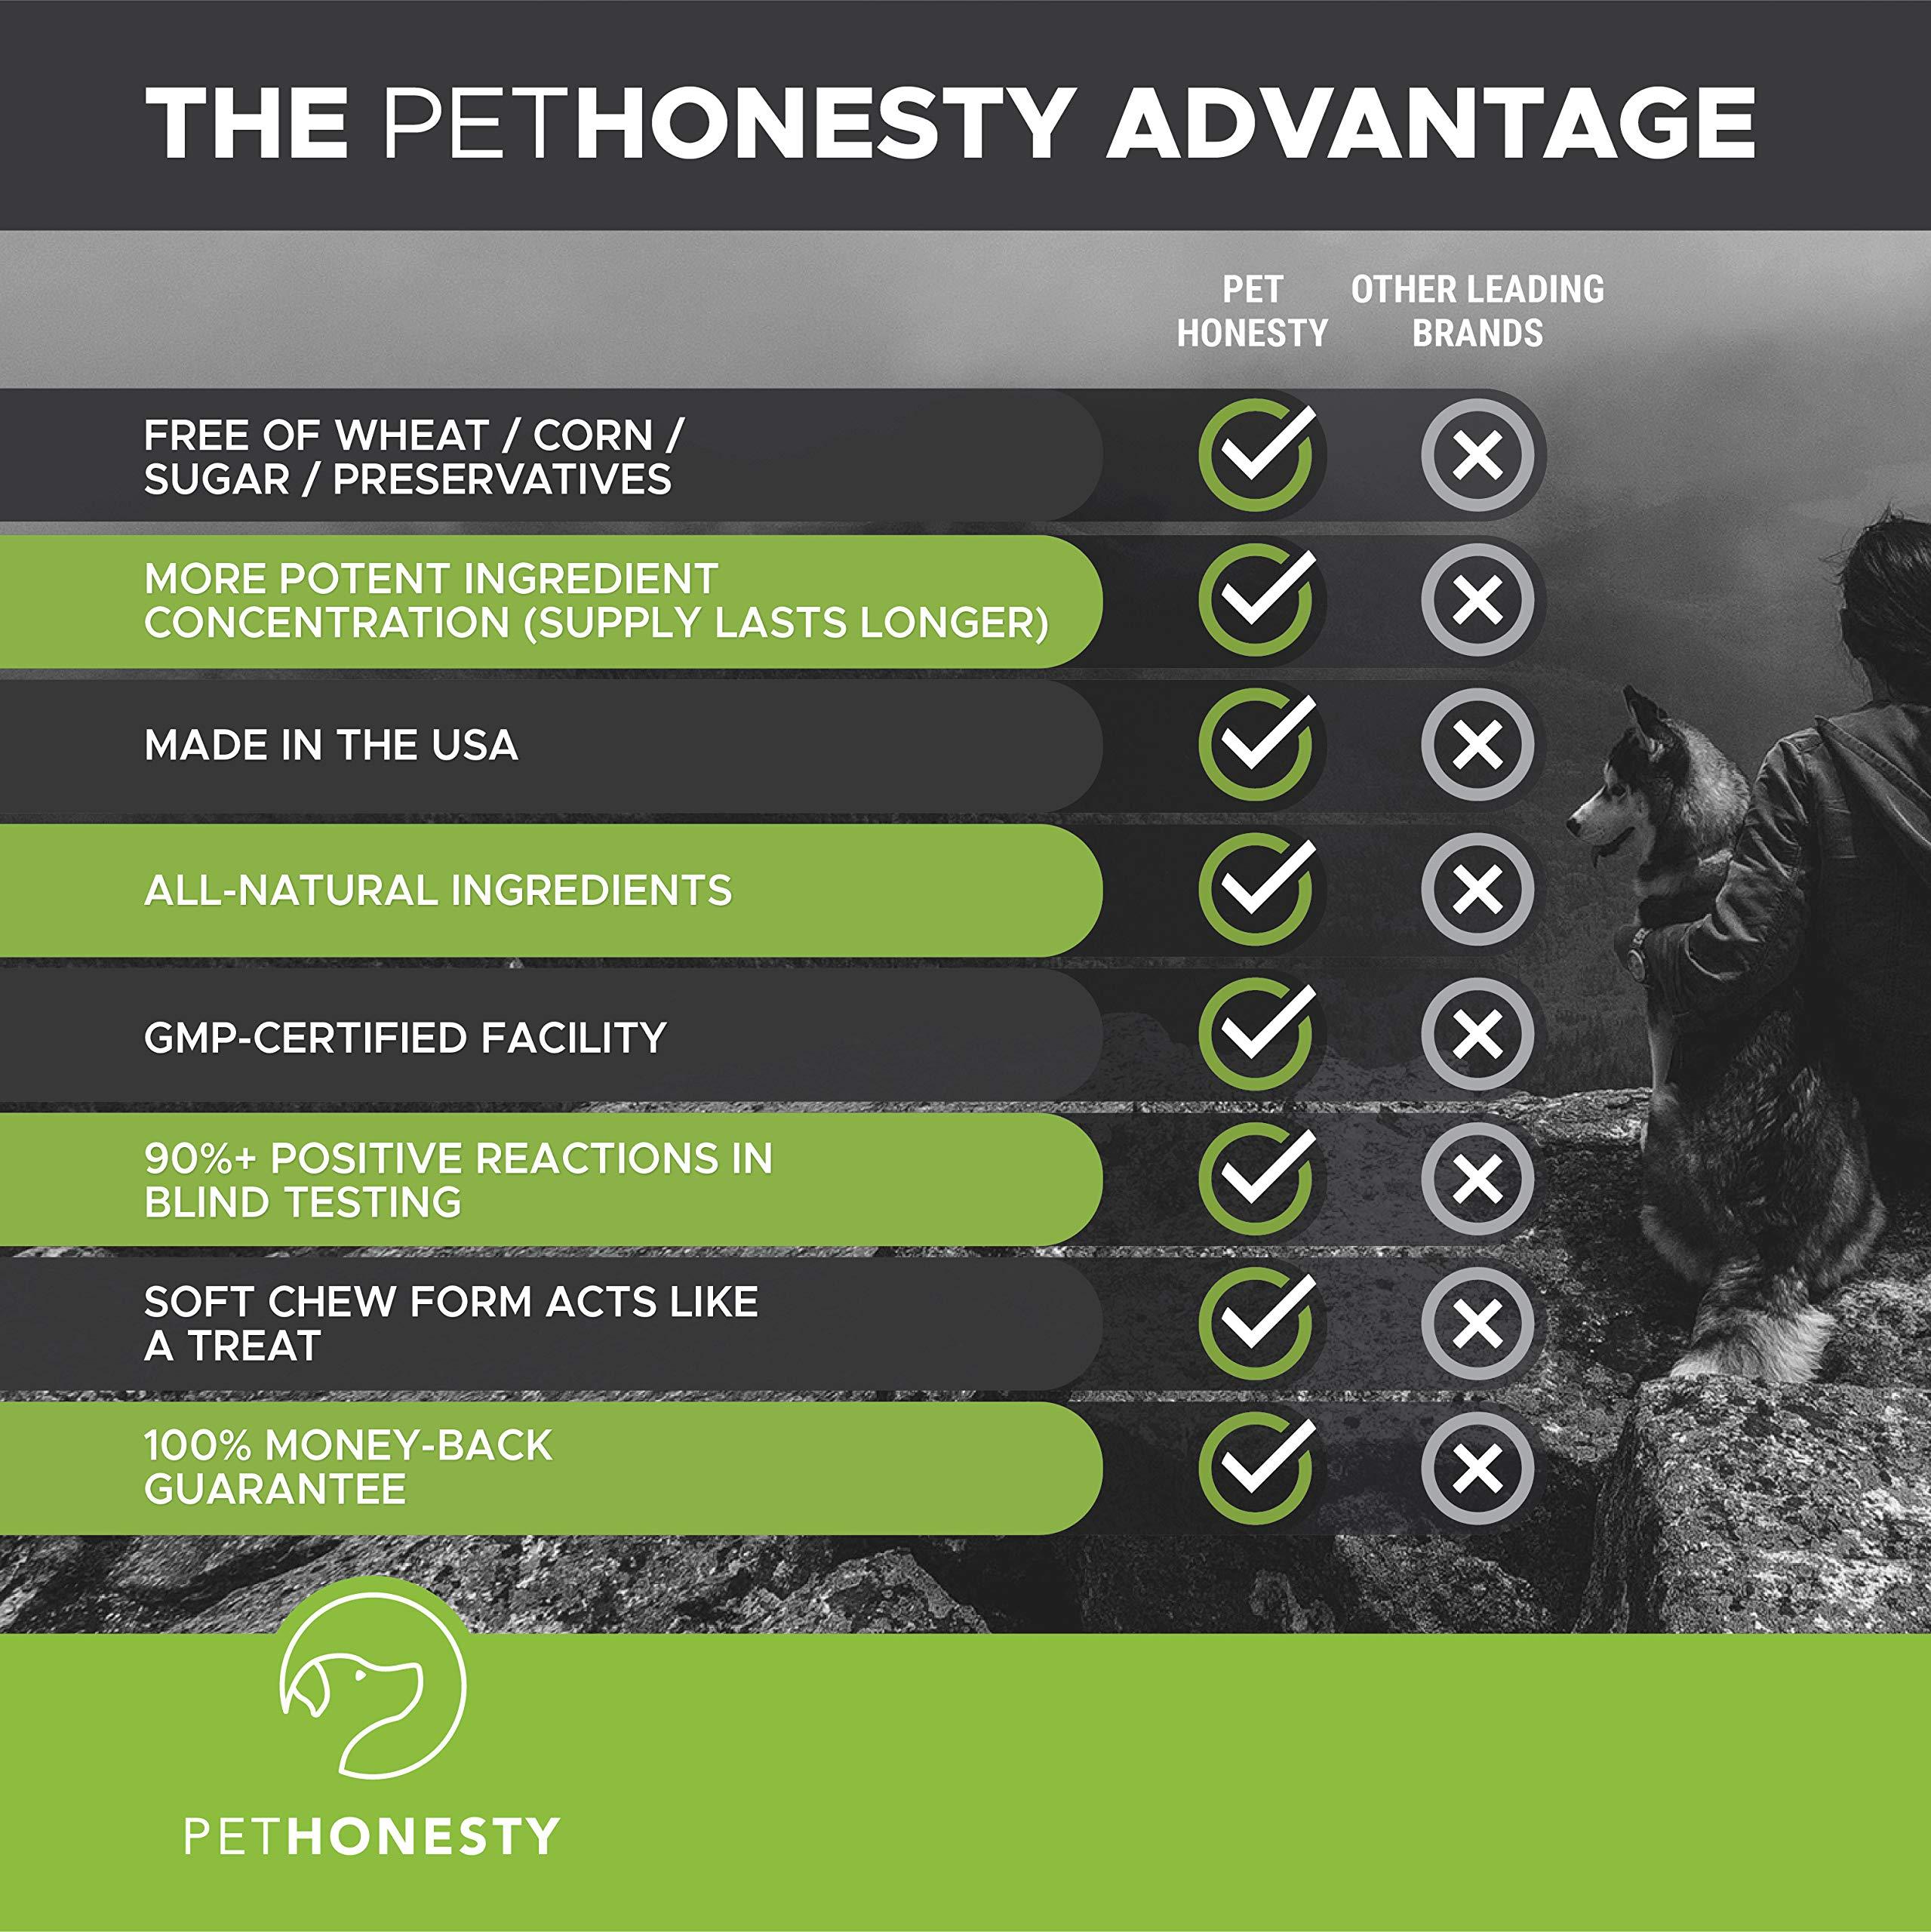 PetHonesty GrassGreen Grass Burn Spot Chews for Dogs - Dog Pee Lawn Spot Saver Treatment Caused by Dog Urine - Cranberry, Apple Cider Vinegar, DL-Methionine Grass Treatment Rocks - 90 Chew Treats by PetHonesty (Image #7)